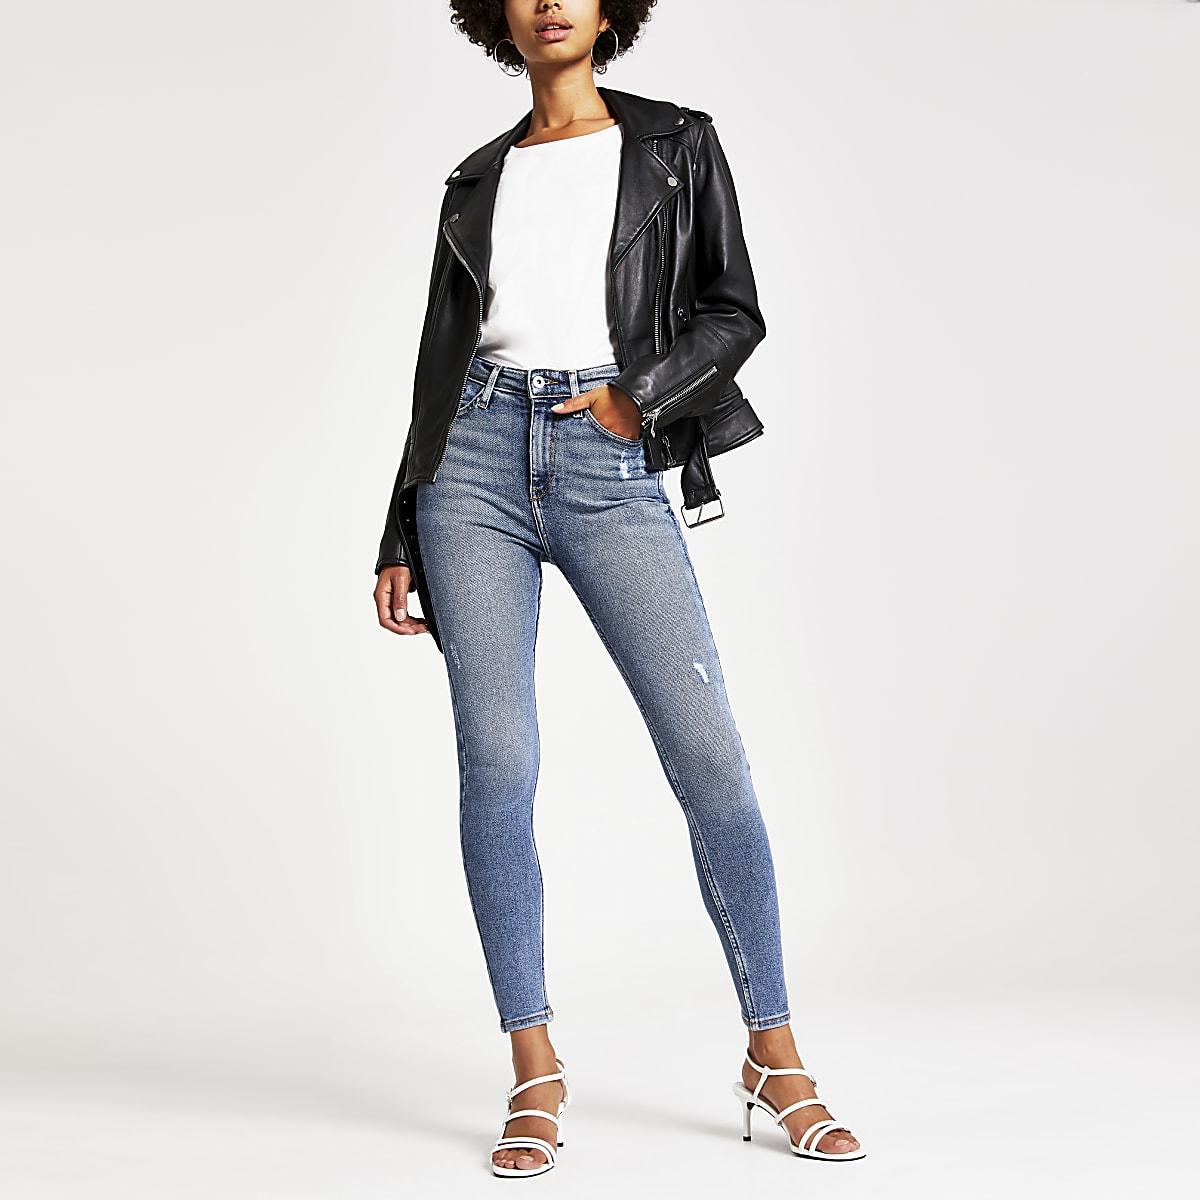 Hailey - Middenblauwe authentieke jeans met hoge taille